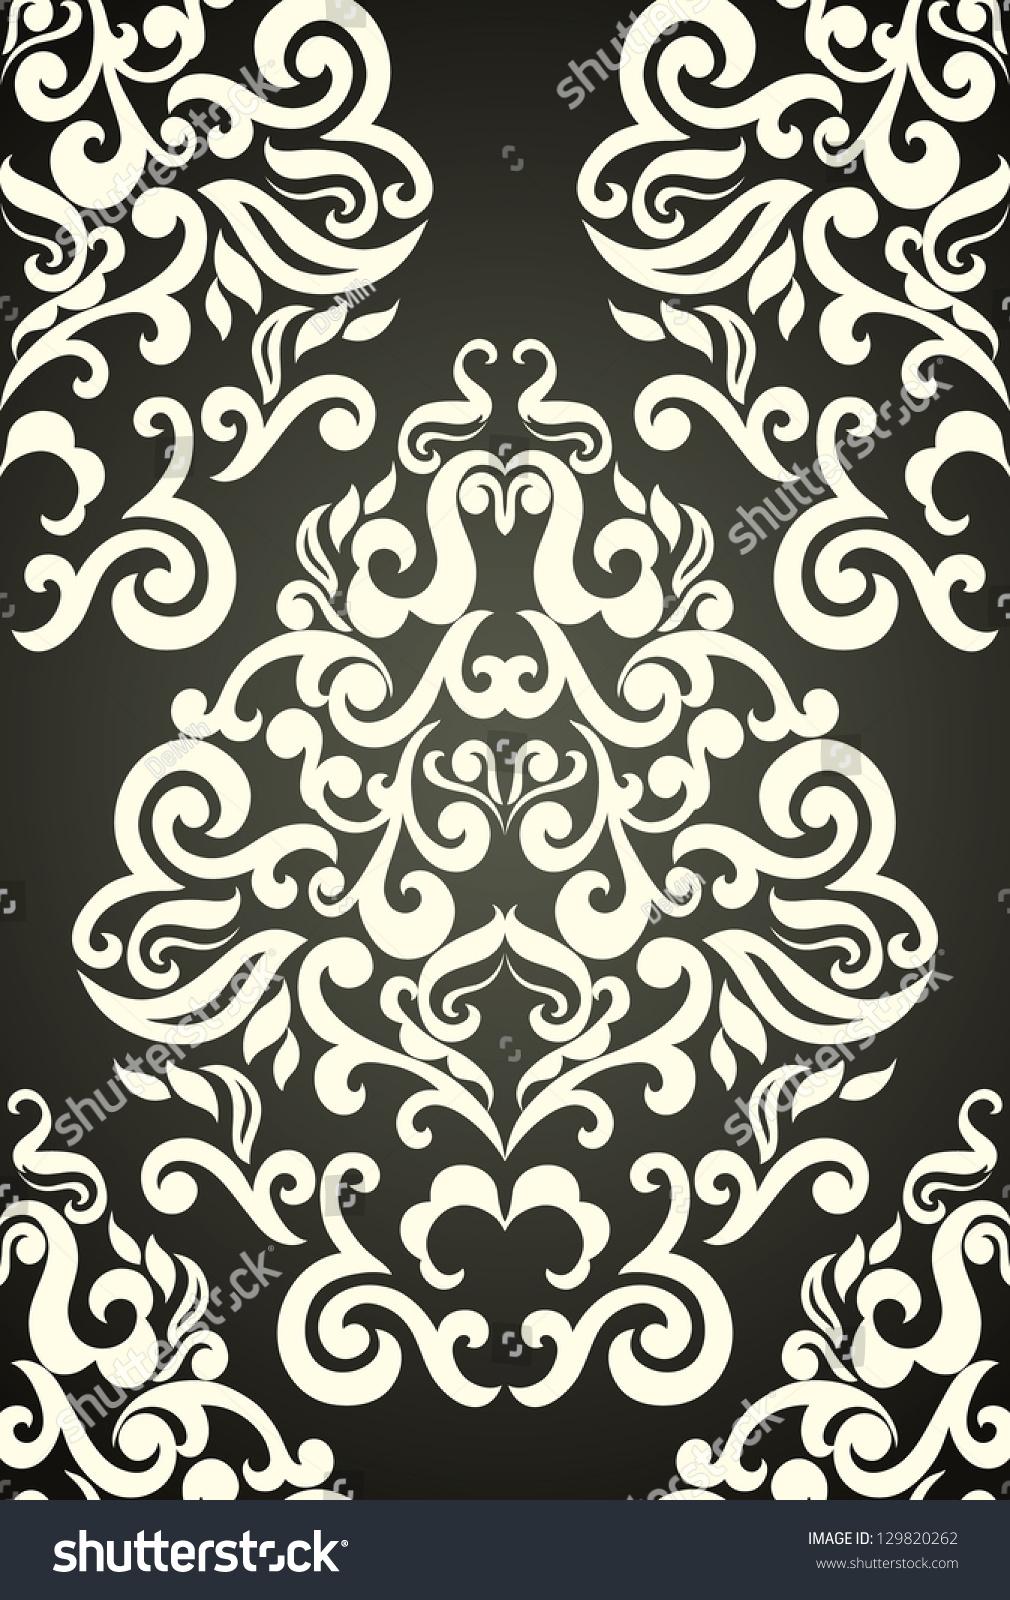 damask wallpaper glamorous and elegant - photo #27